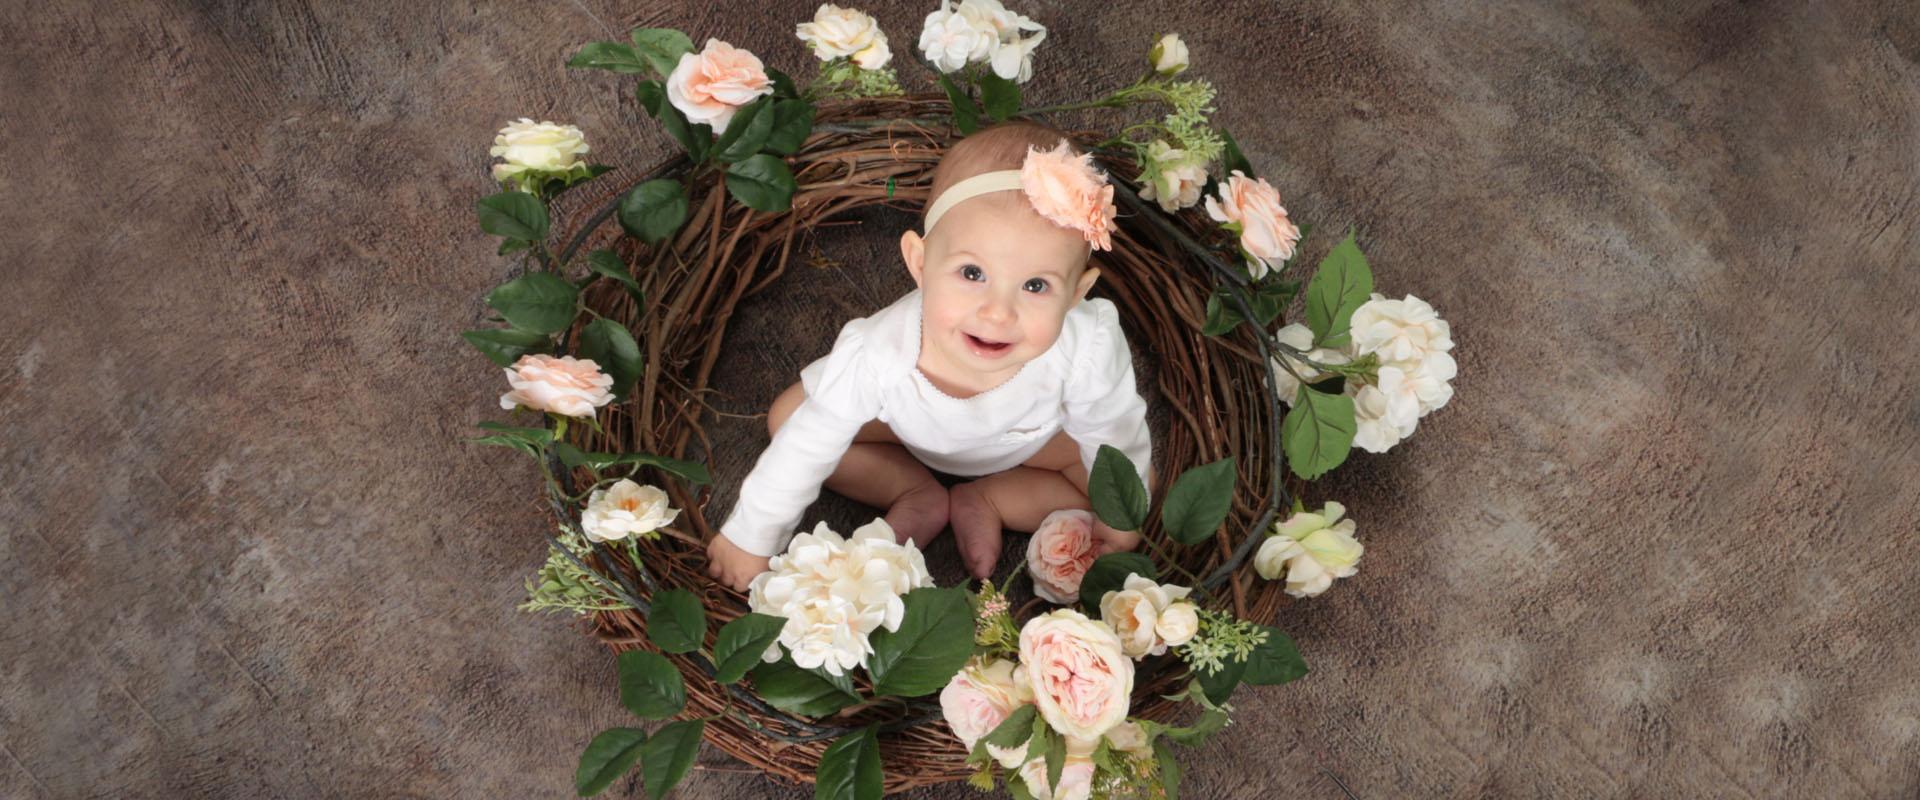 Baby girl Spring portrait with flower garland